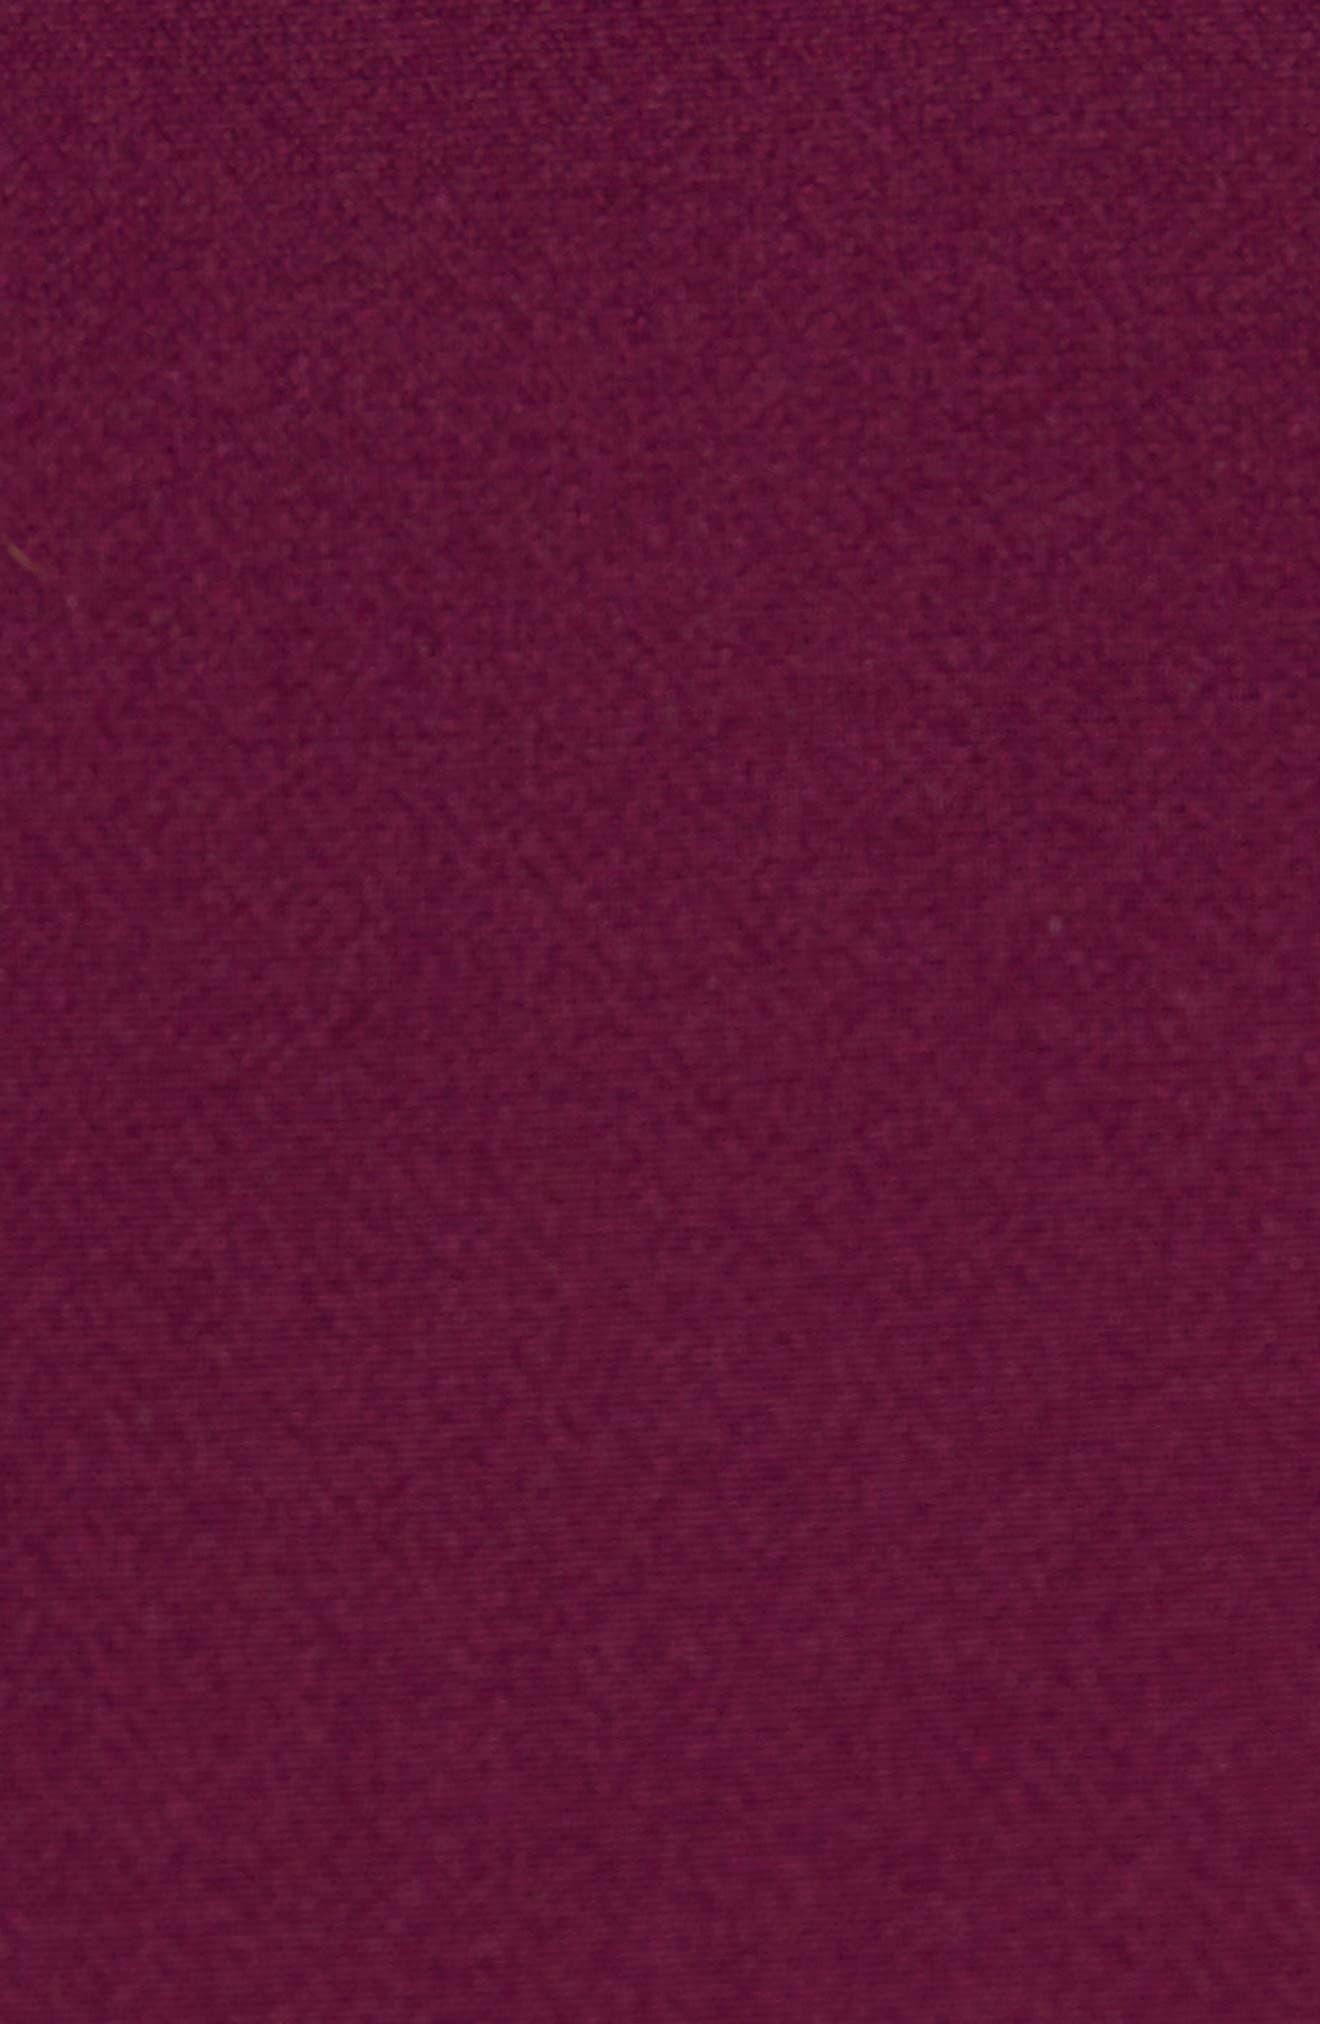 Morgan Italian Cady Bell Sleeve Mini Dress,                             Alternate thumbnail 5, color,                             500